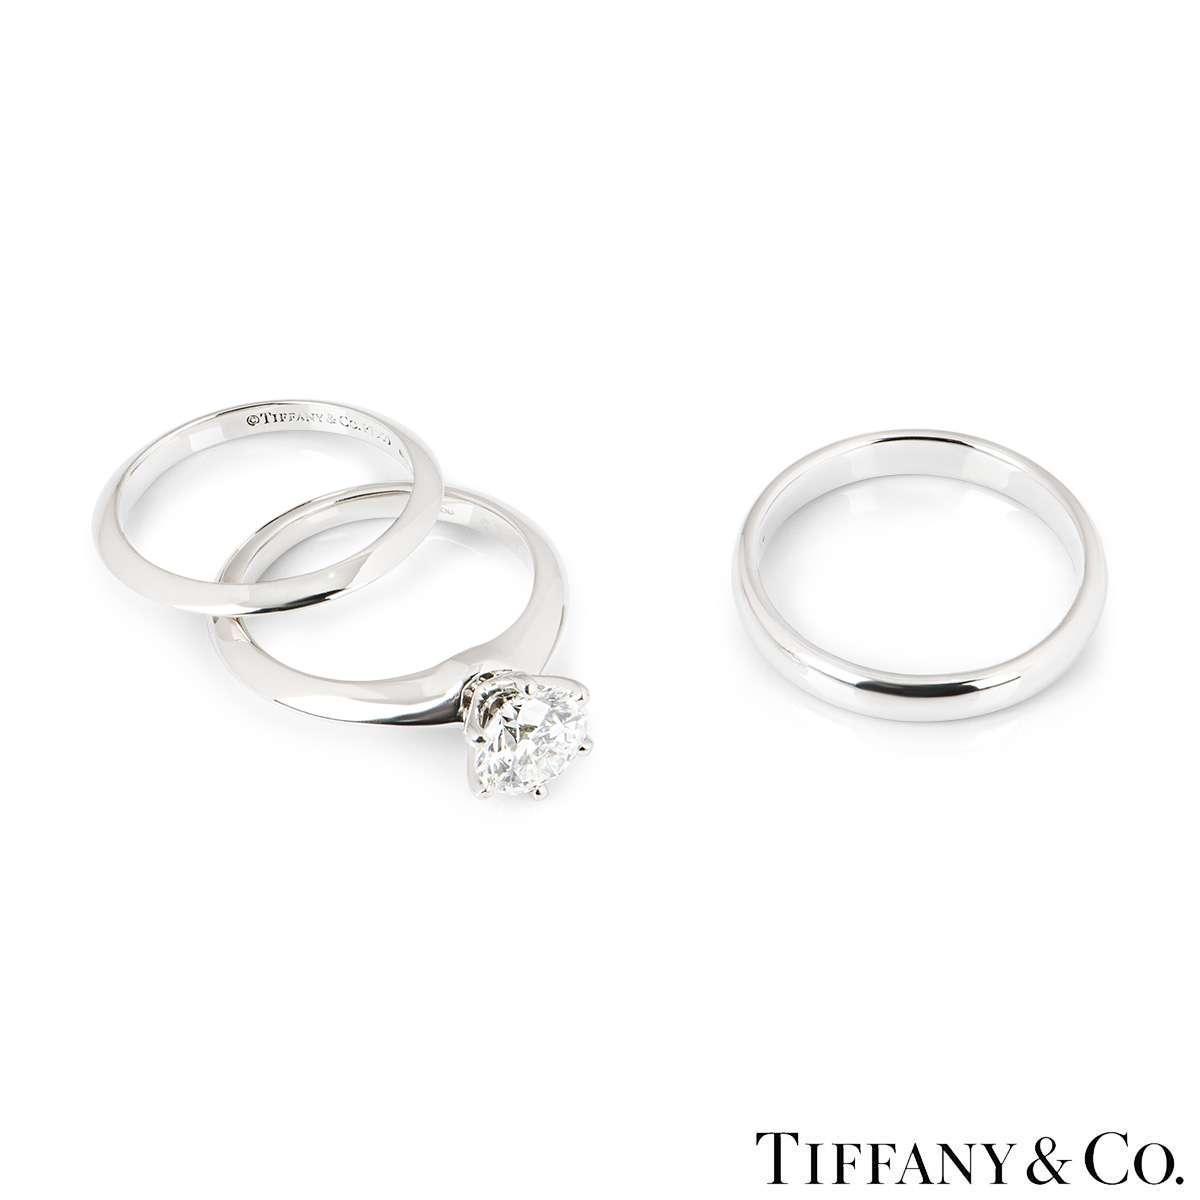 Tiffany & Co. Platinum Diamond Bridal Set 1.21ct H/VS1